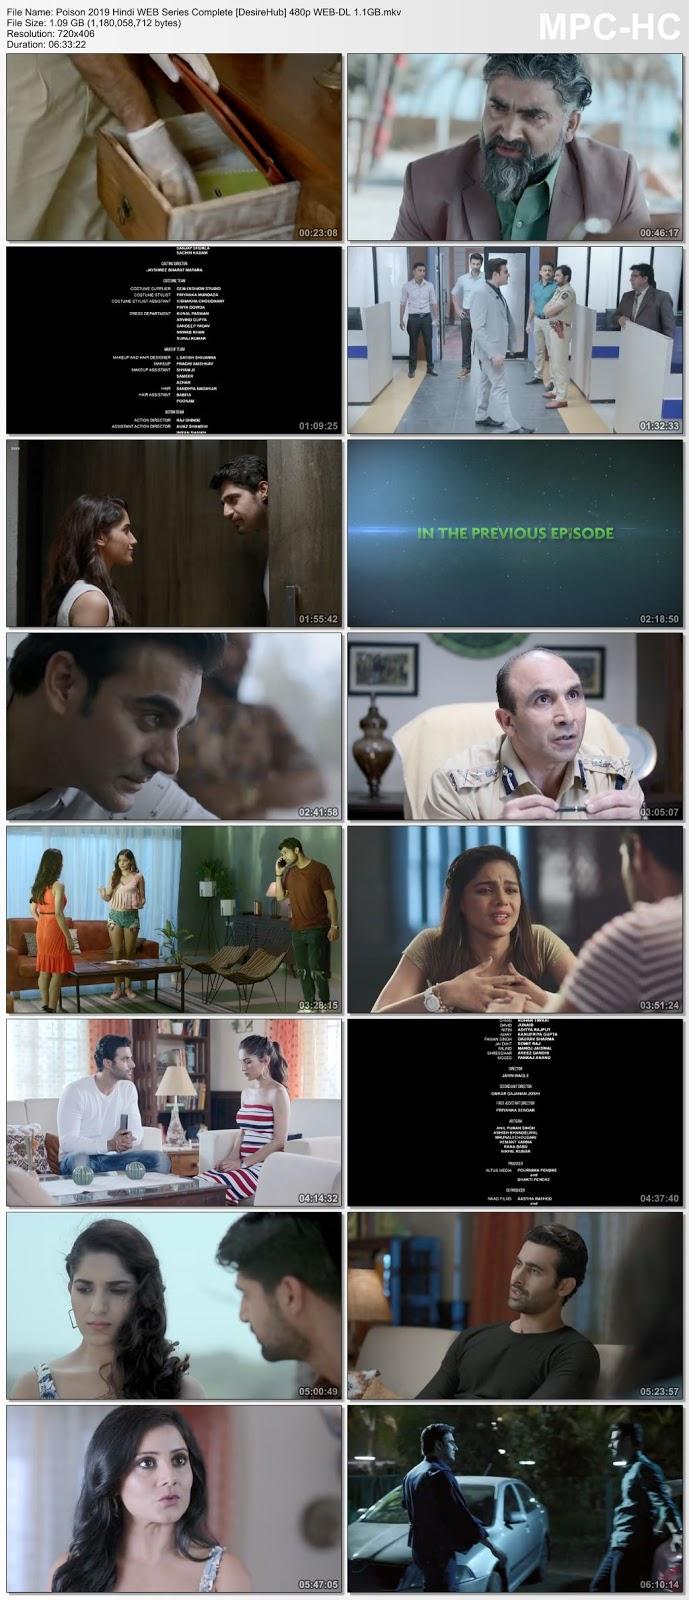 Poison 2019 Hindi WEB Series Complete 480p WEB-DL 1.1GB Desirehub